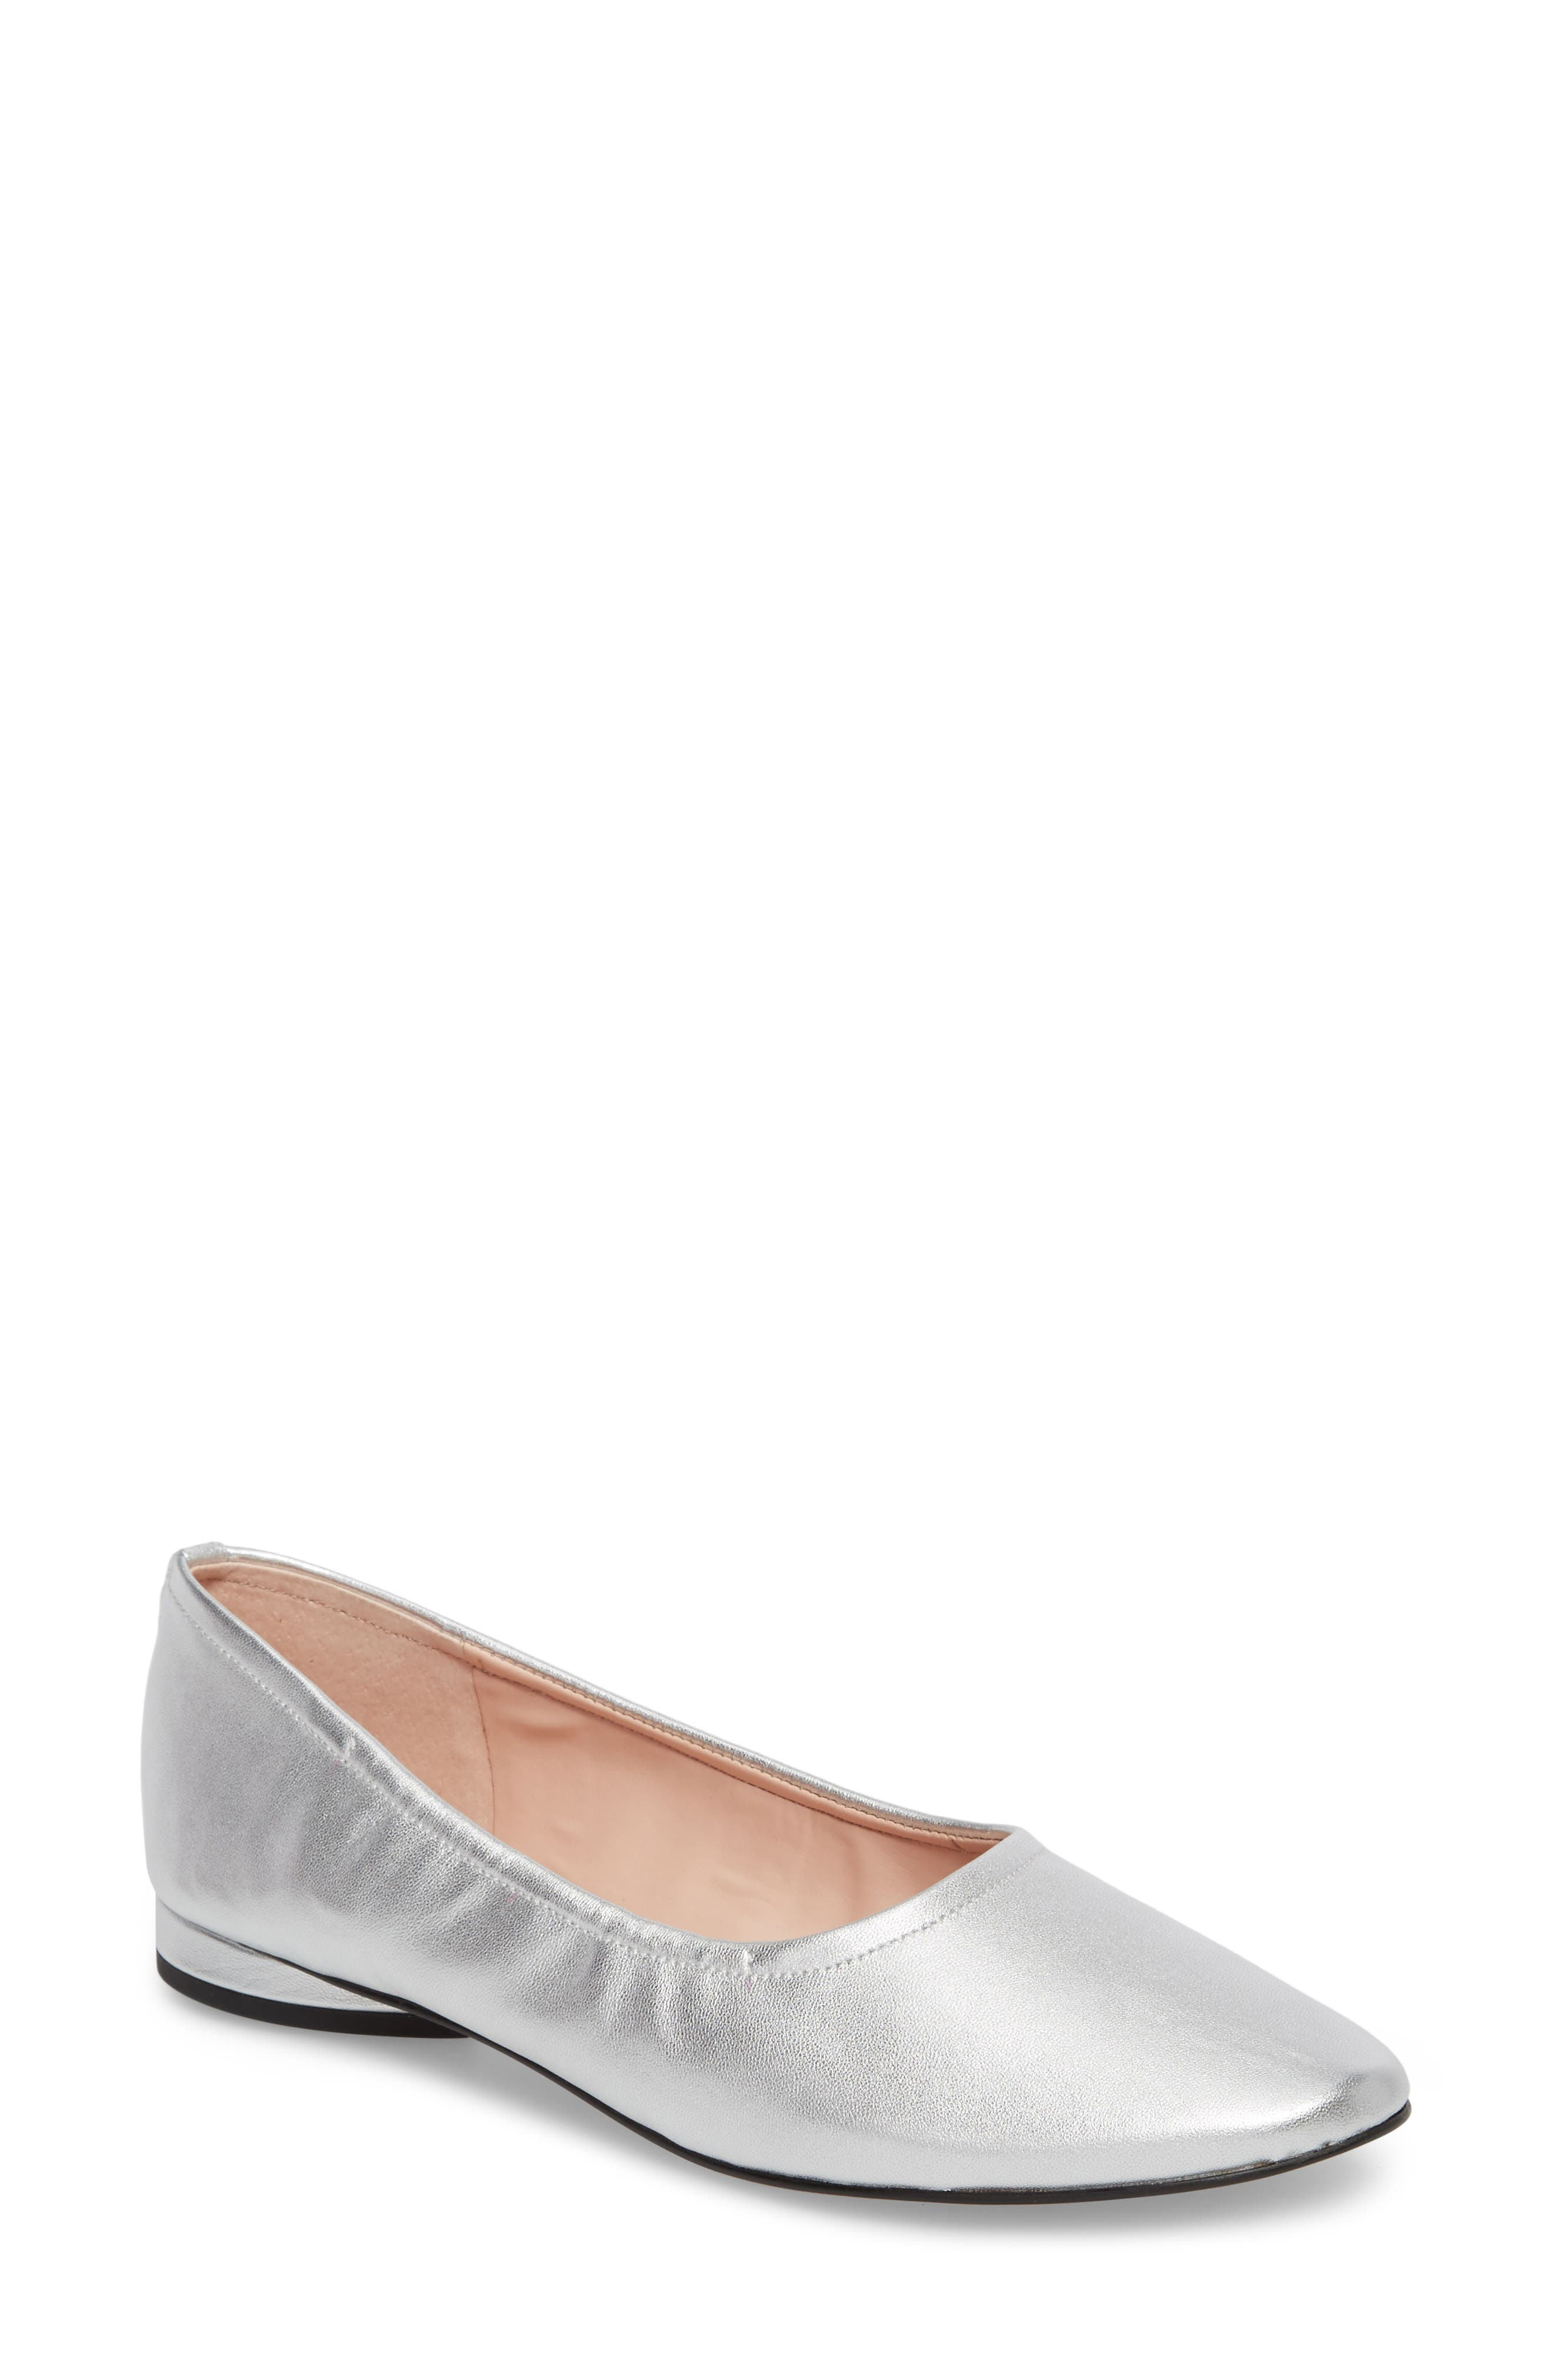 Myrina Ballet Flat,                         Main,                         color, 040